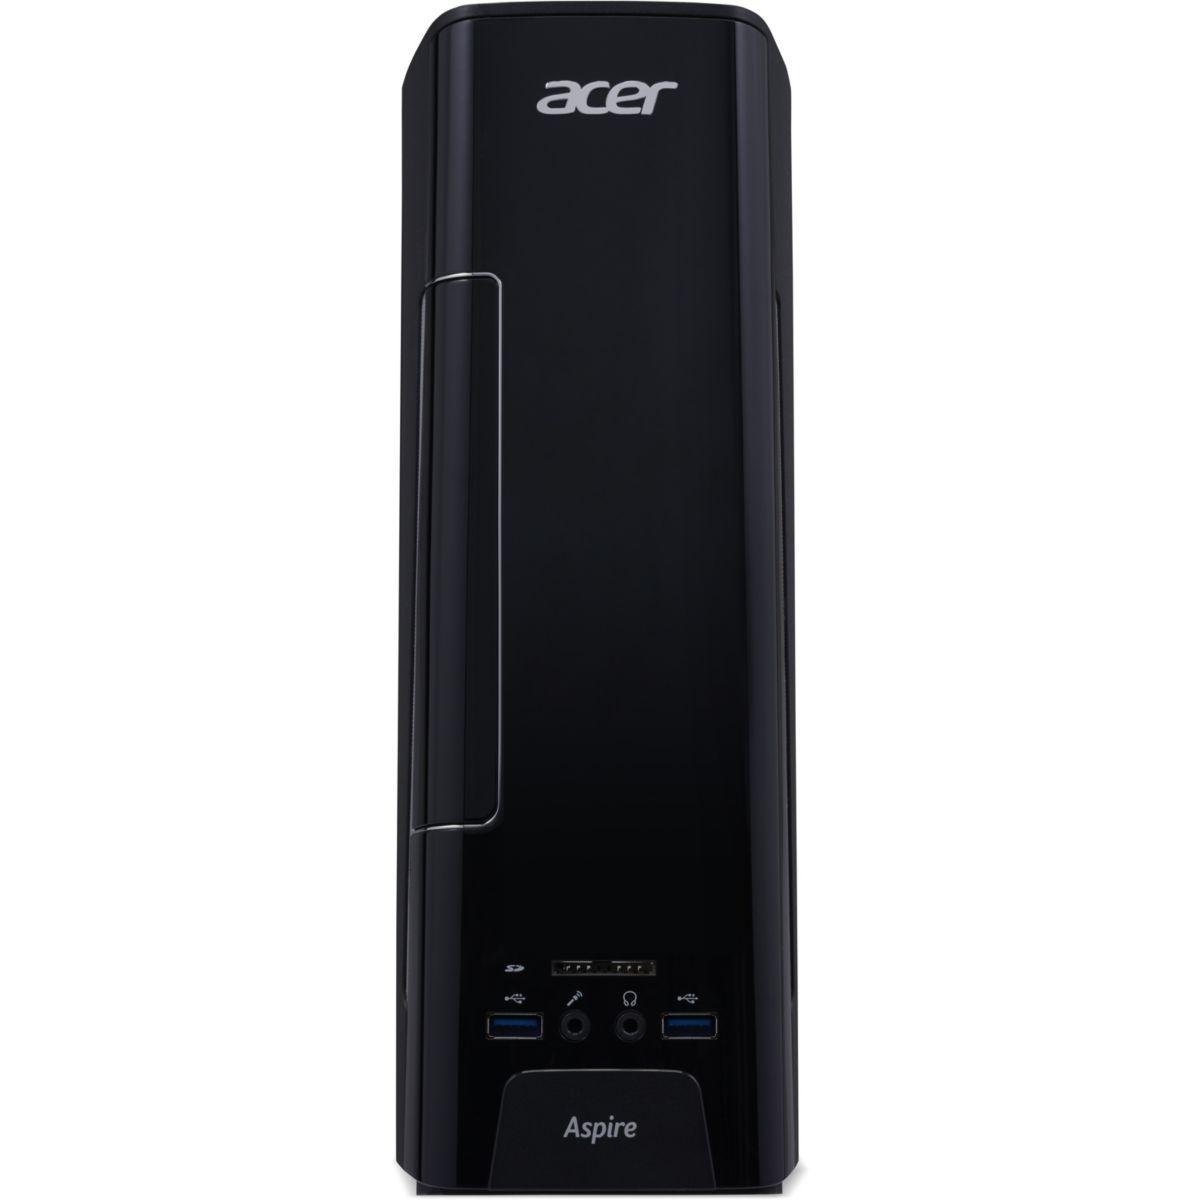 Ordi ACER Aspire AXC-230 (photo)